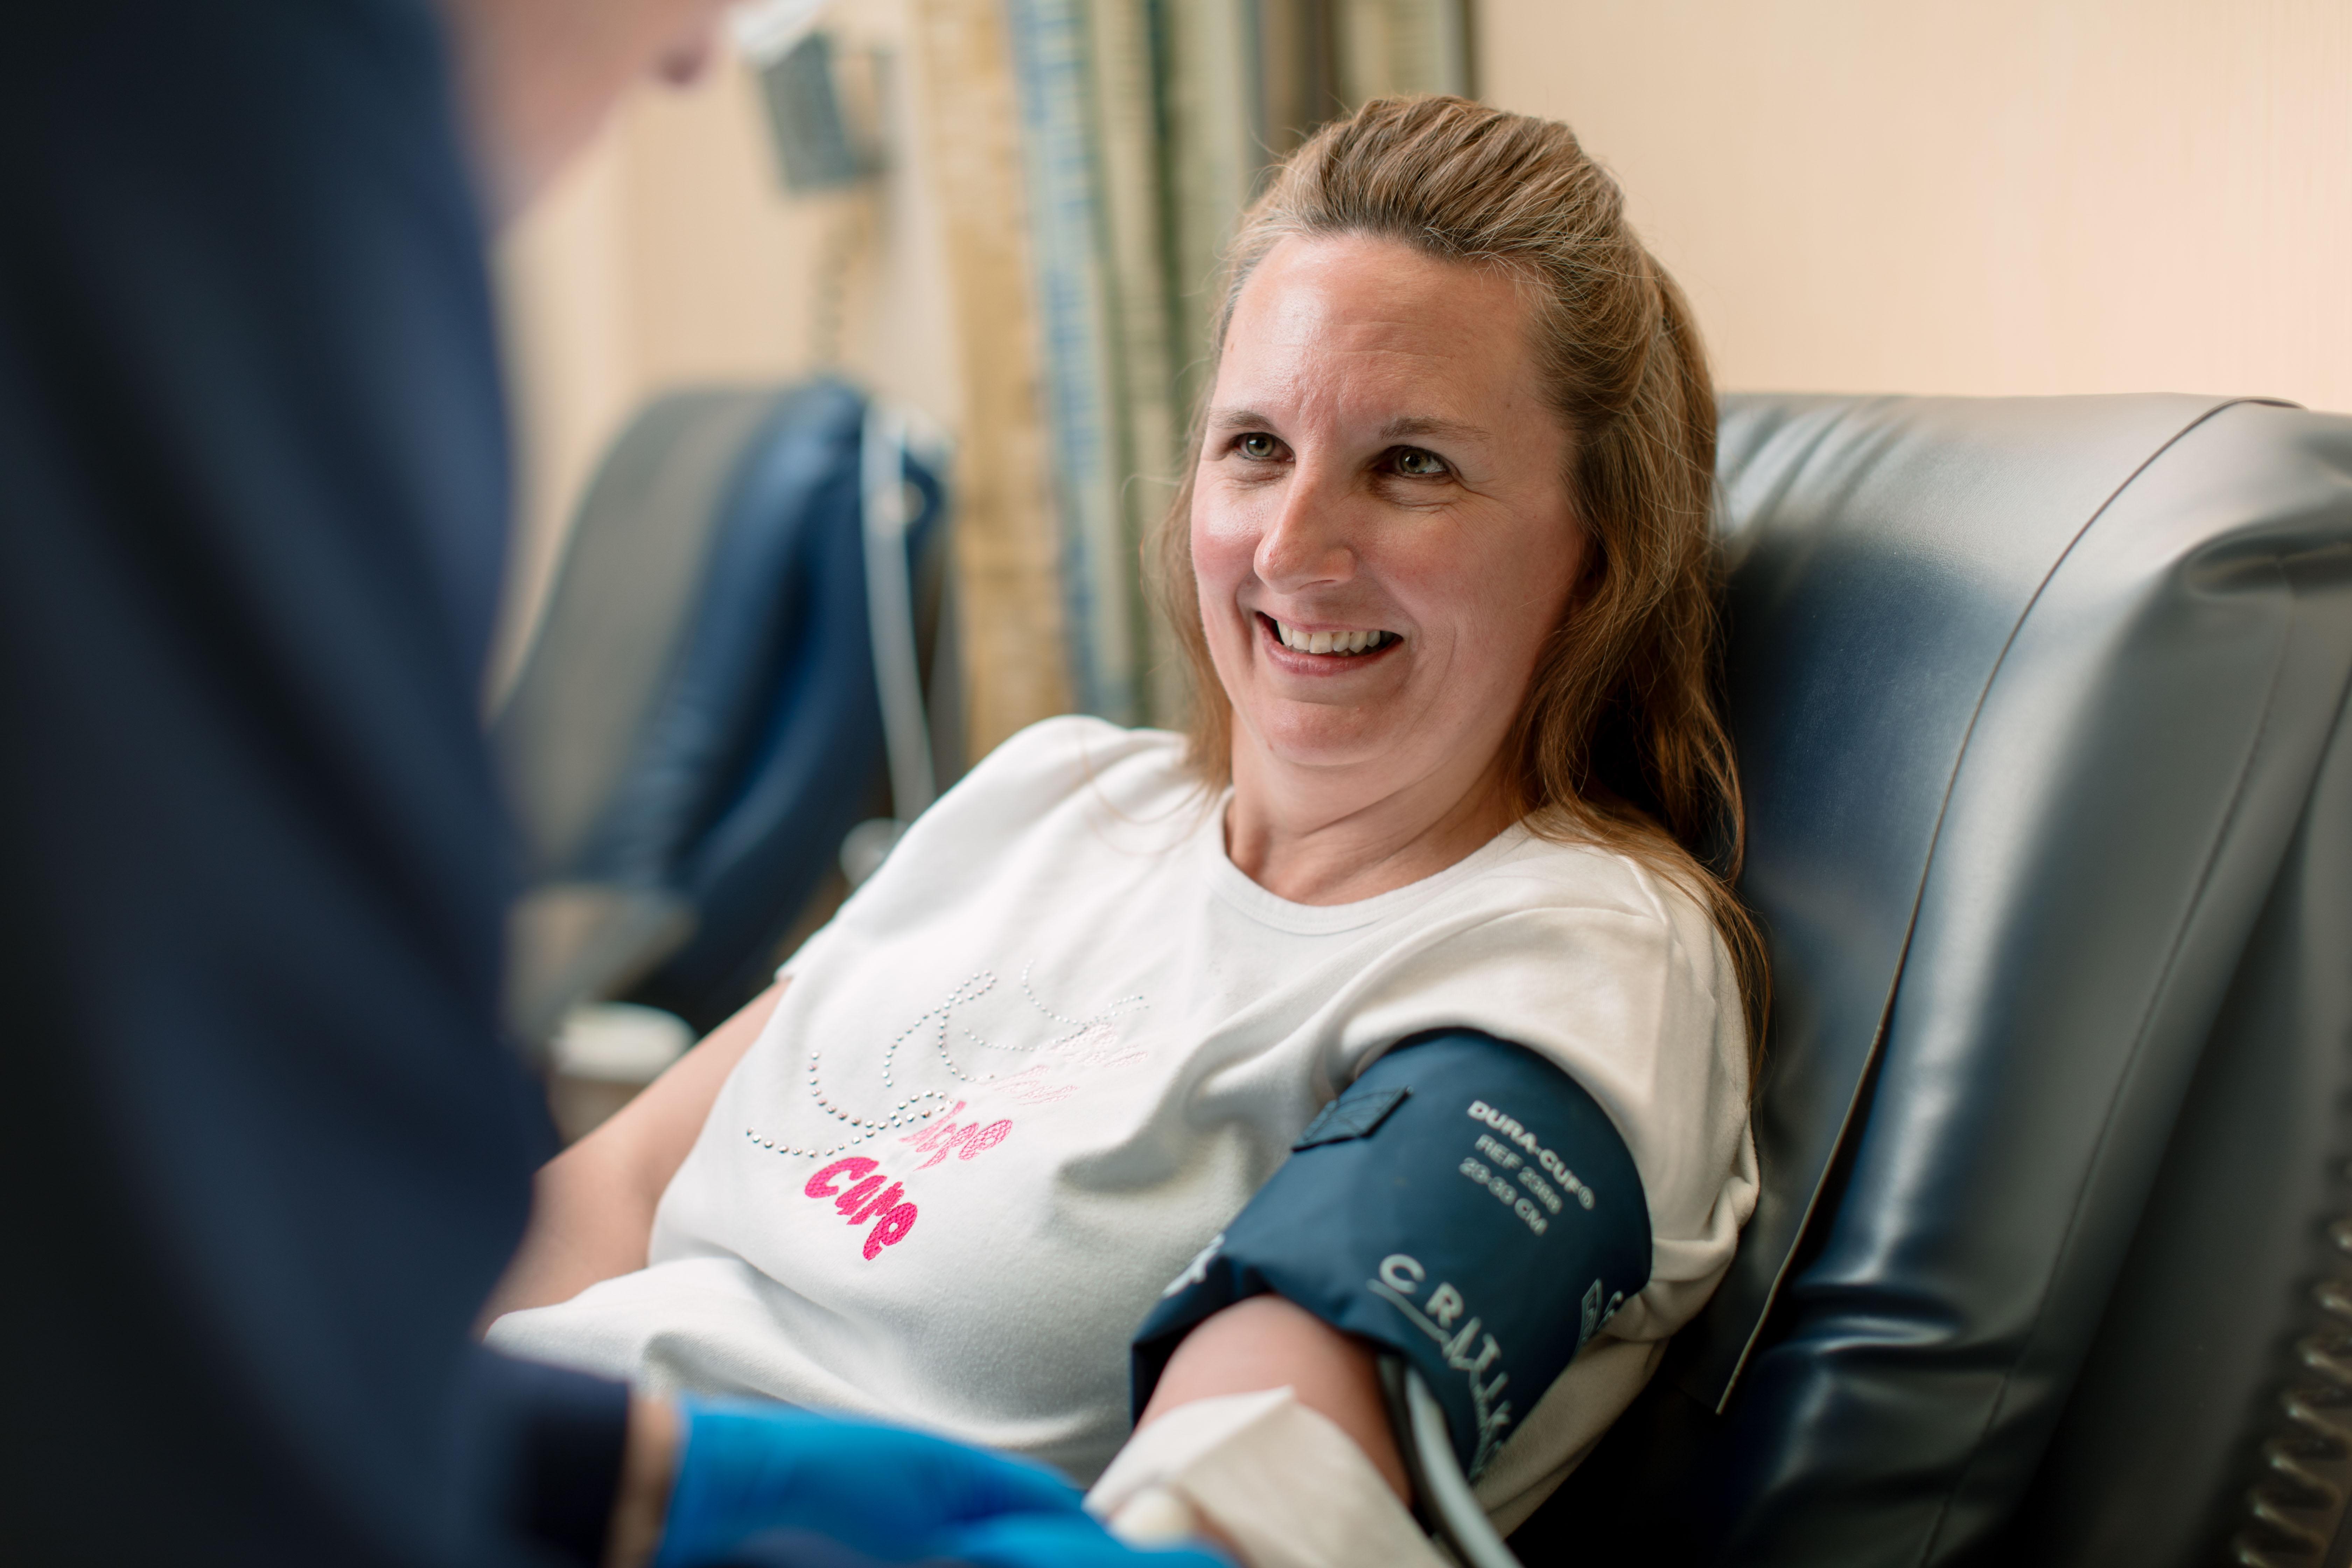 Robyn donating